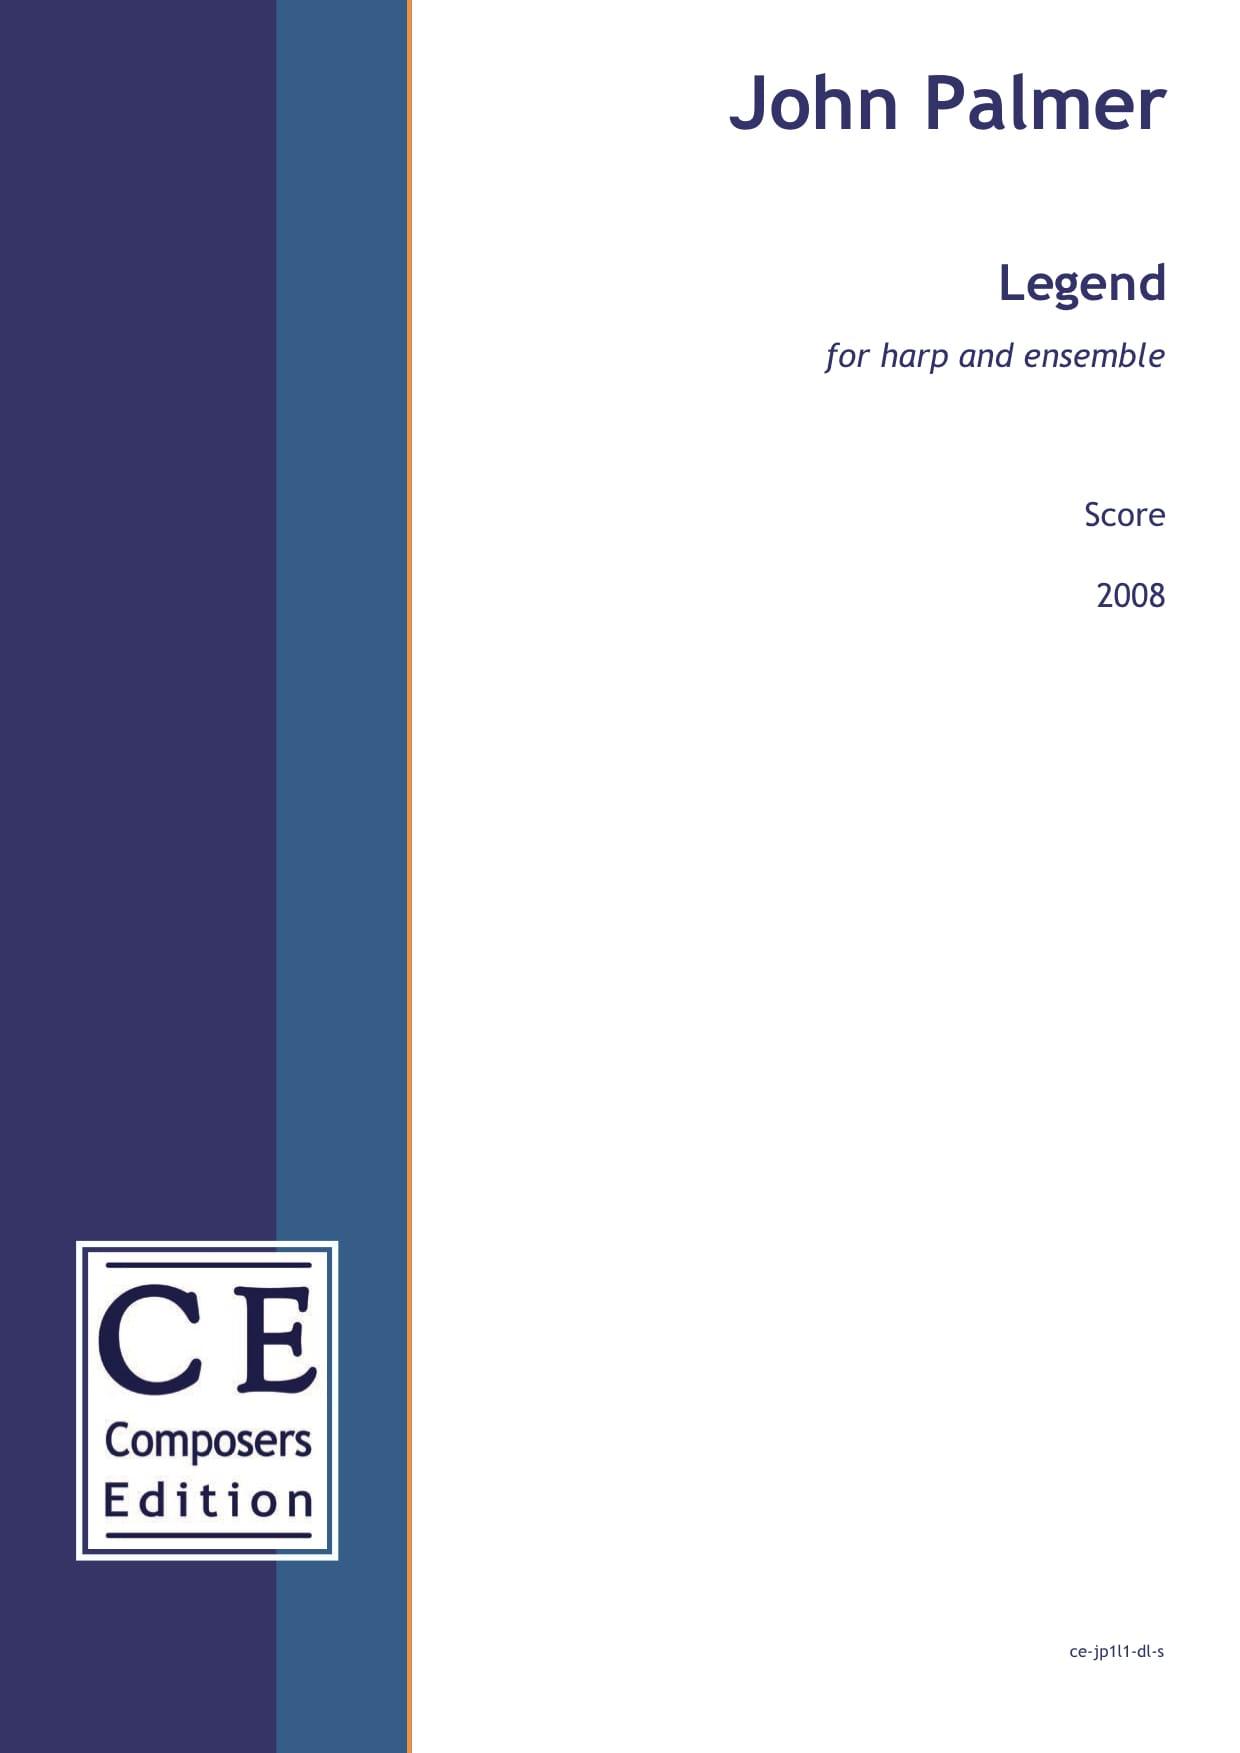 John Palmer: Legend for harp and ensemble